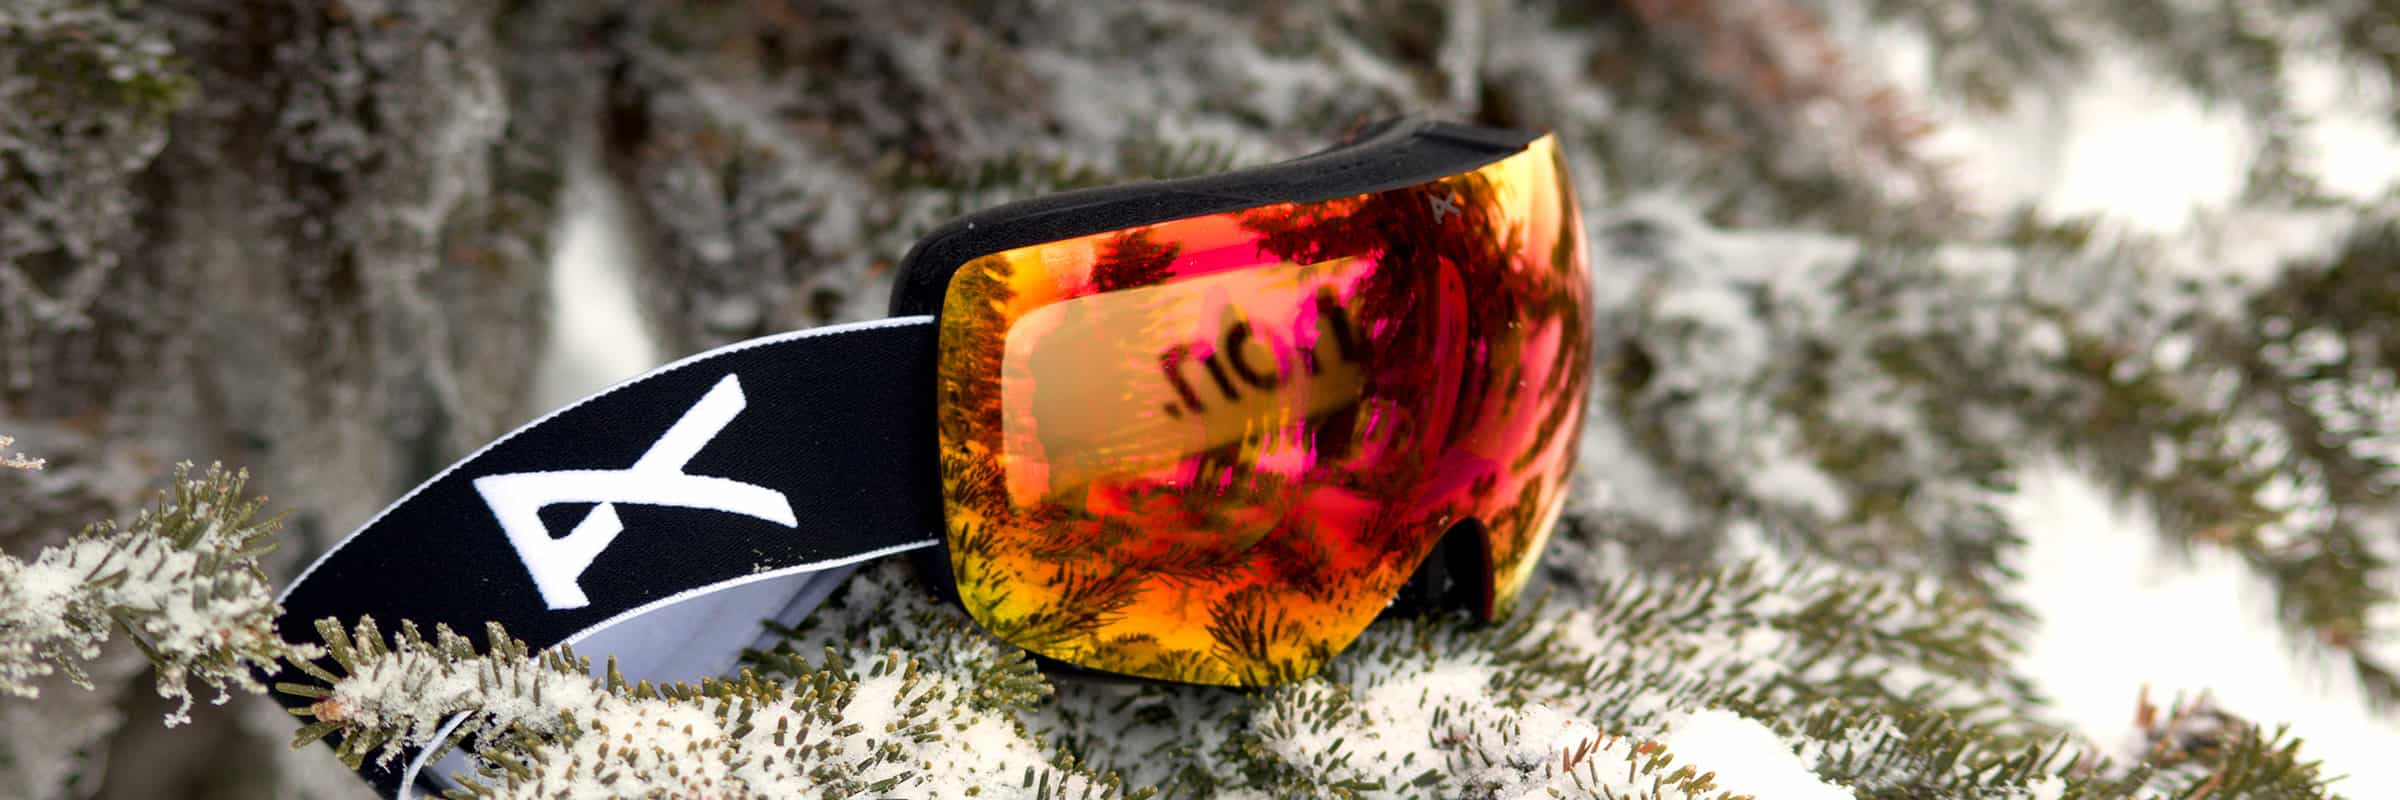 Anon, Ski & Snowboard. Anon MIG Ski Goggles Reviewed